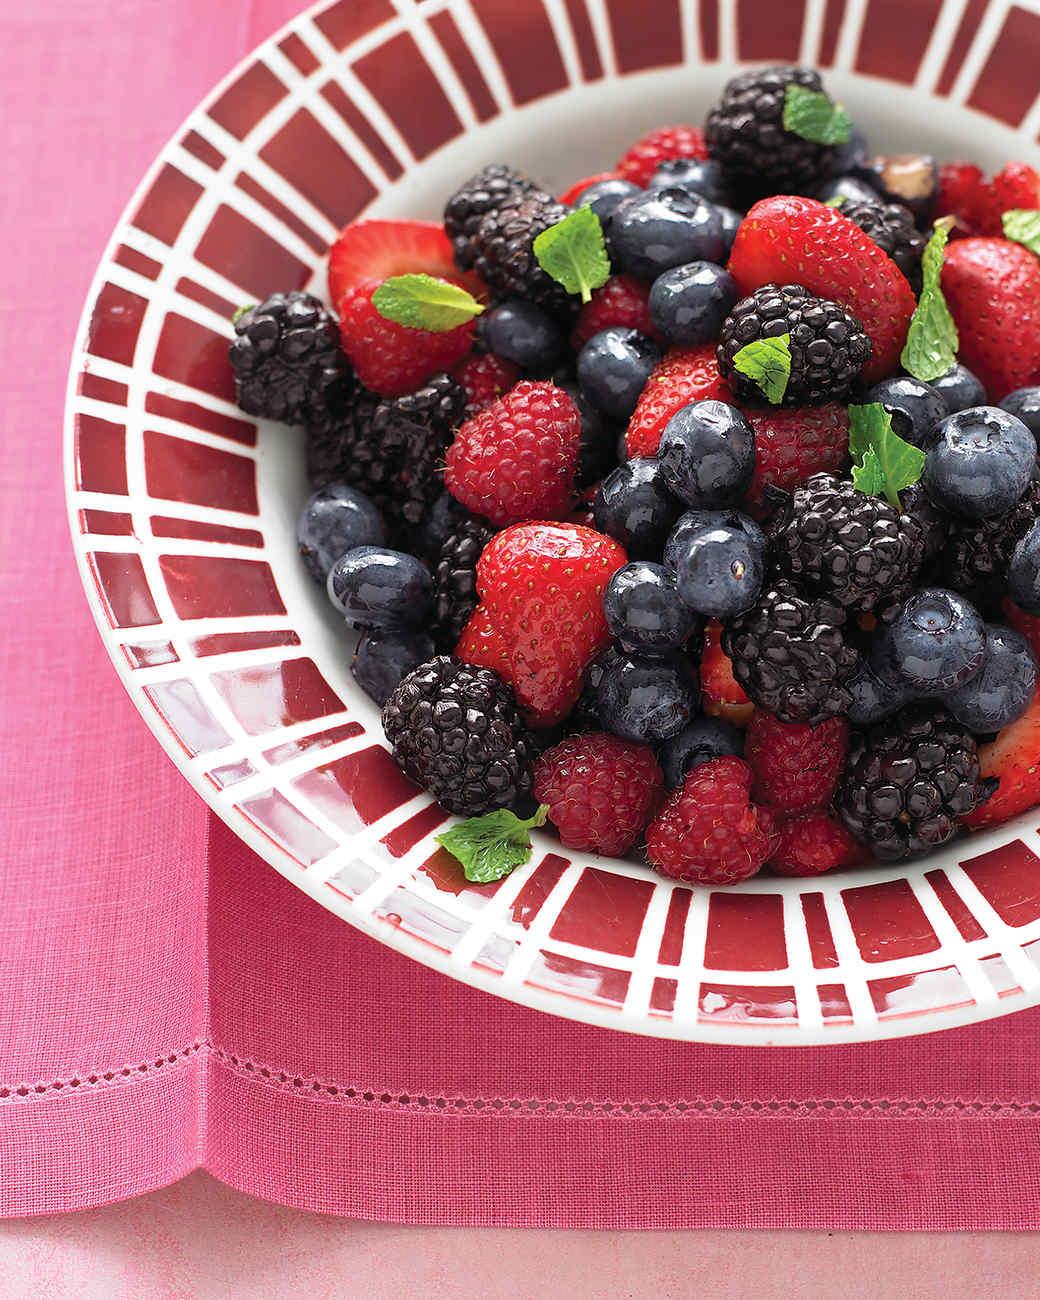 http://www.marthastewart.com/sites/files/marthastewart.com/styles/wmax-520-highdpi/public/d27/med103901d_0708_berry_salad/med103901d_0708_berry_salad_vert.jpg?itok=2A1MWdJv